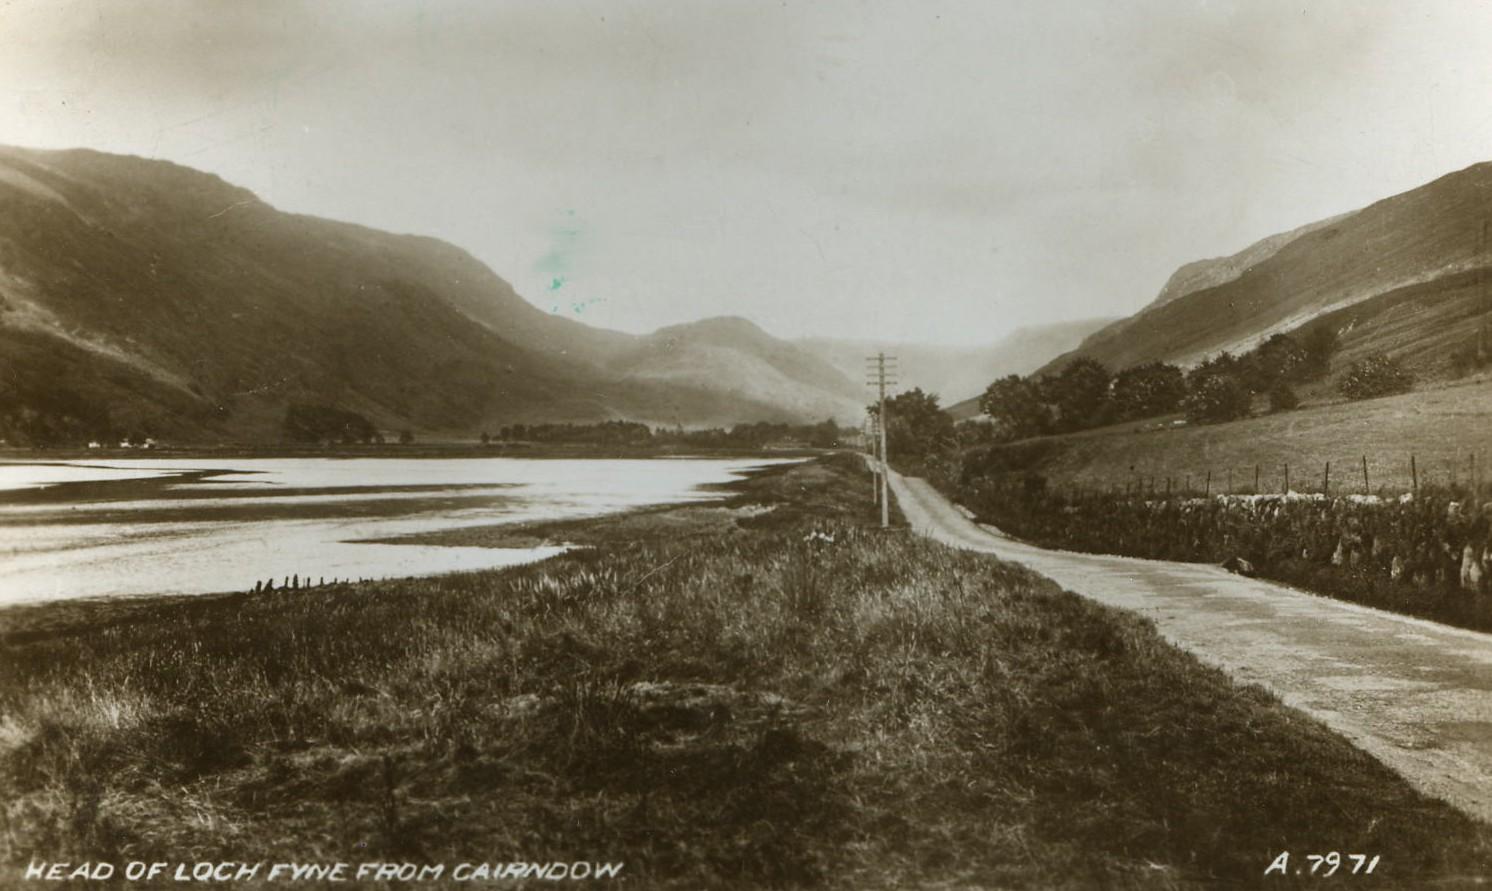 Head of Loch Fyne from Cairndow